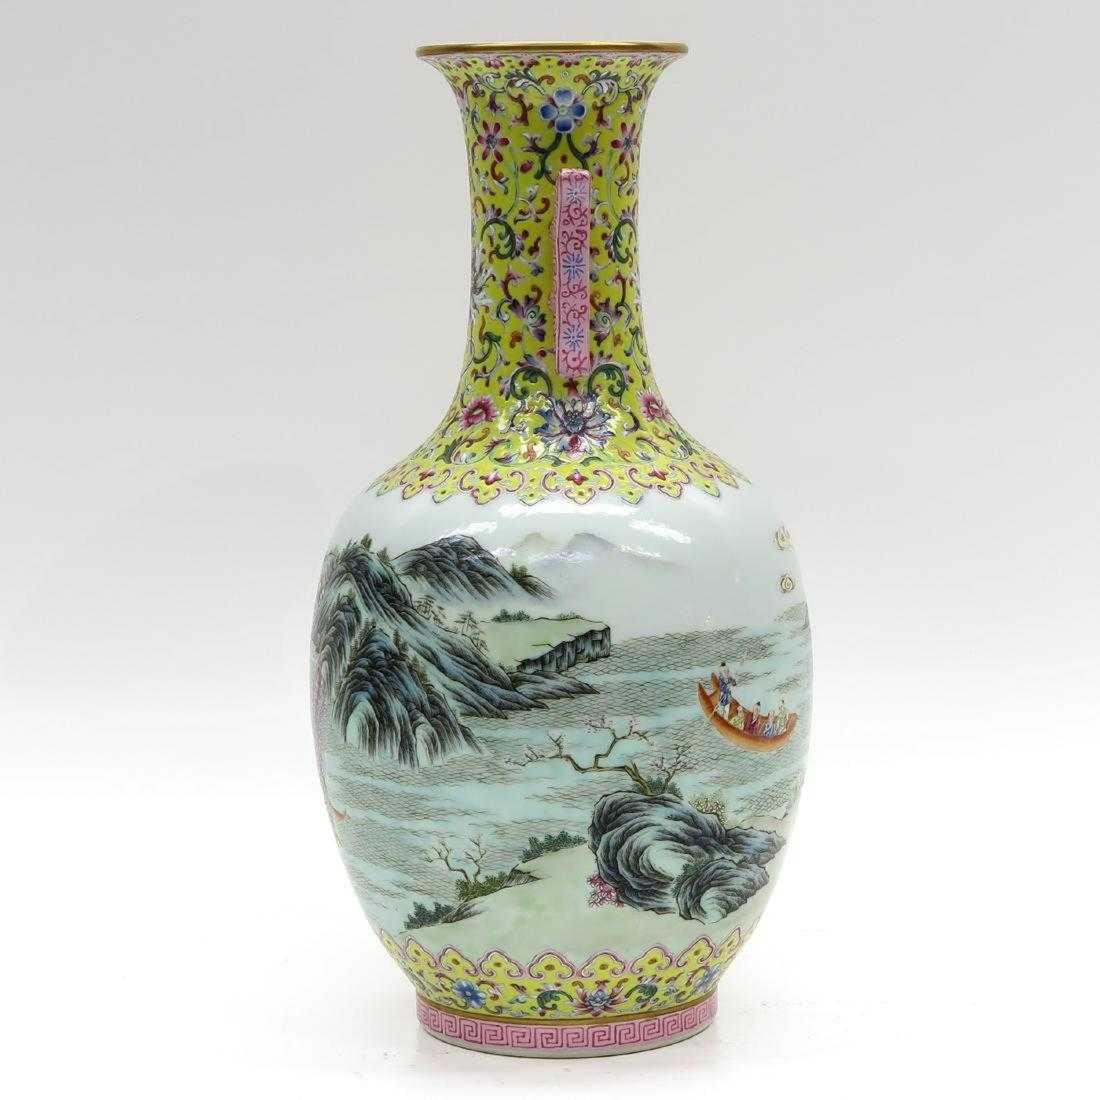 Chinese Famille Rose Enamel Decor Vase - 2